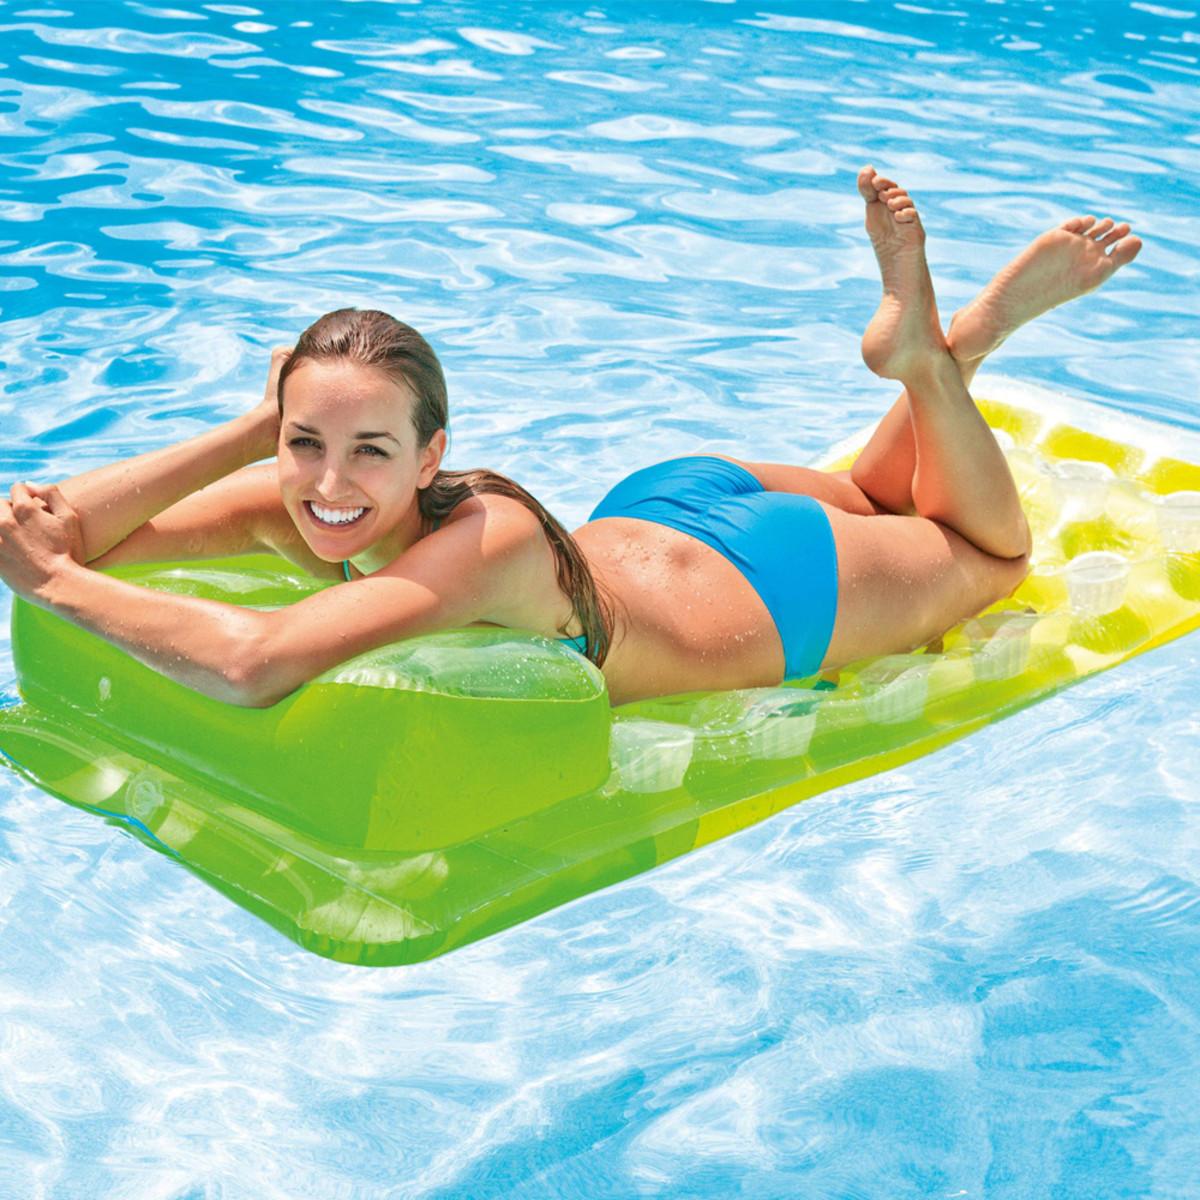 Intex pocket fashion lounge green mattresses splash super center for Intex swim centre family lounge pool cover